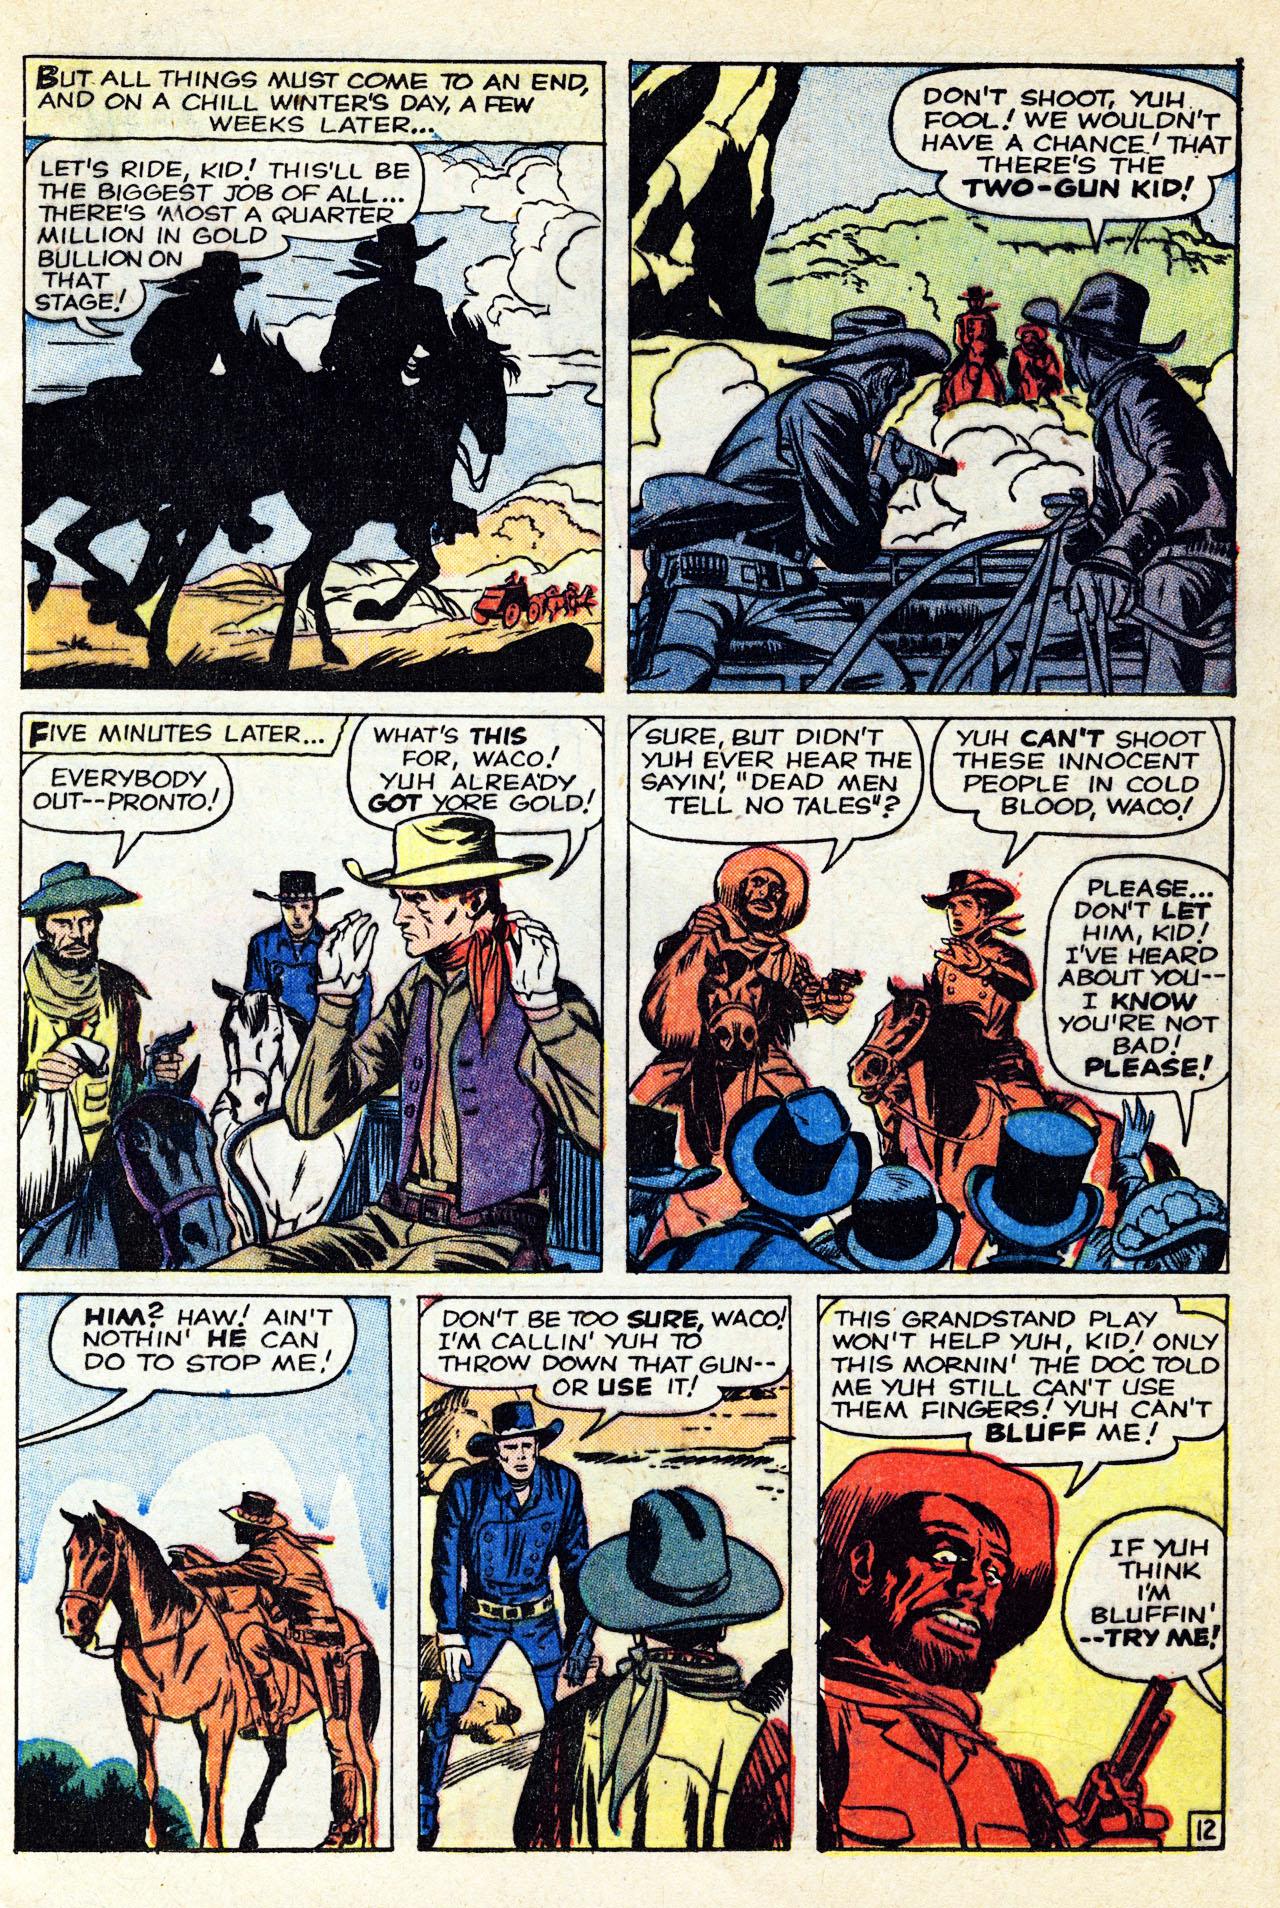 Read online Two-Gun Kid comic -  Issue #59 - 17